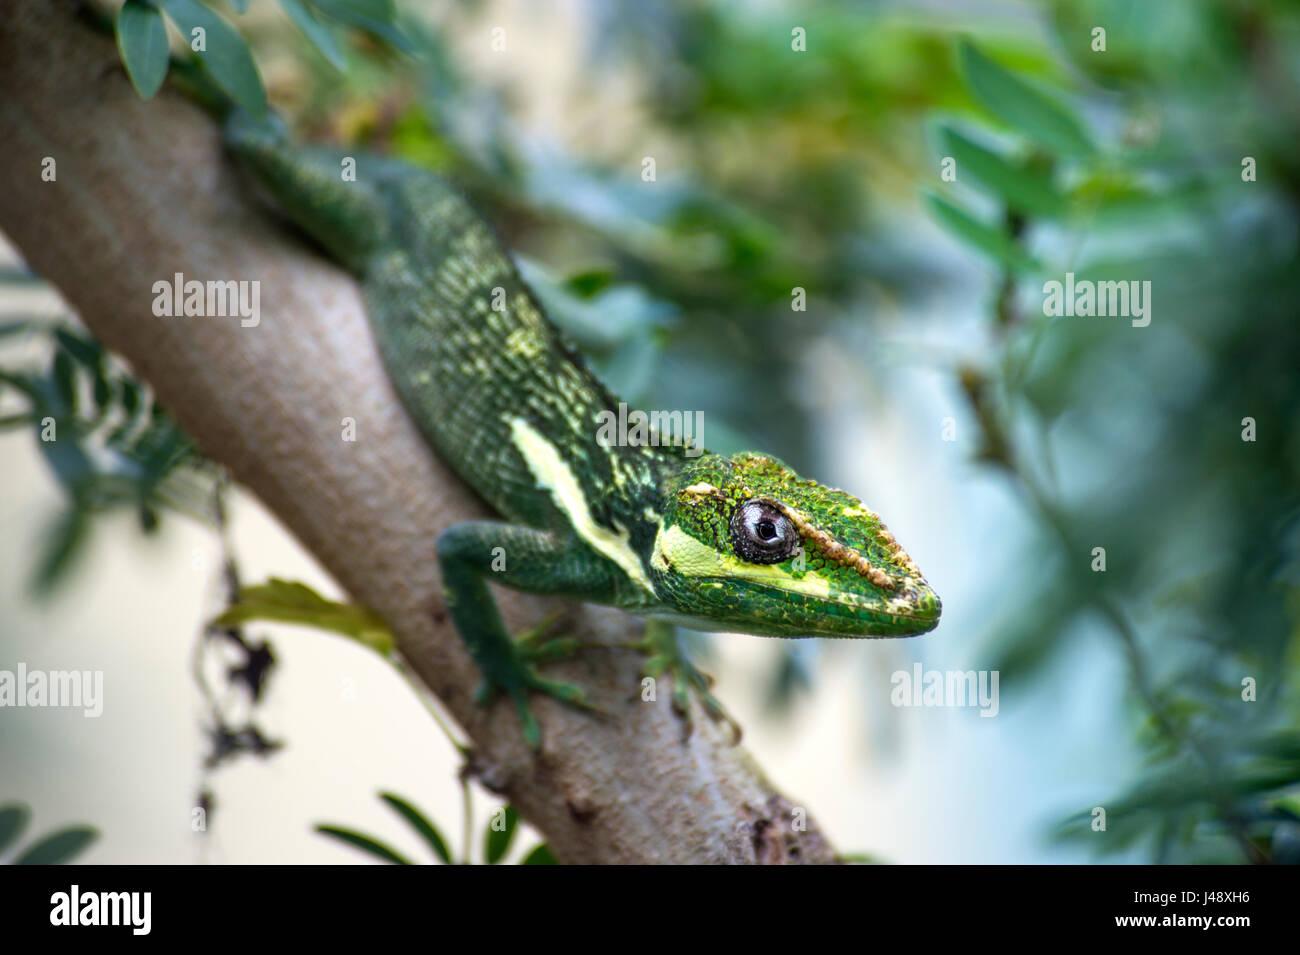 Reptile Knight Anole Lizard - Stock Image